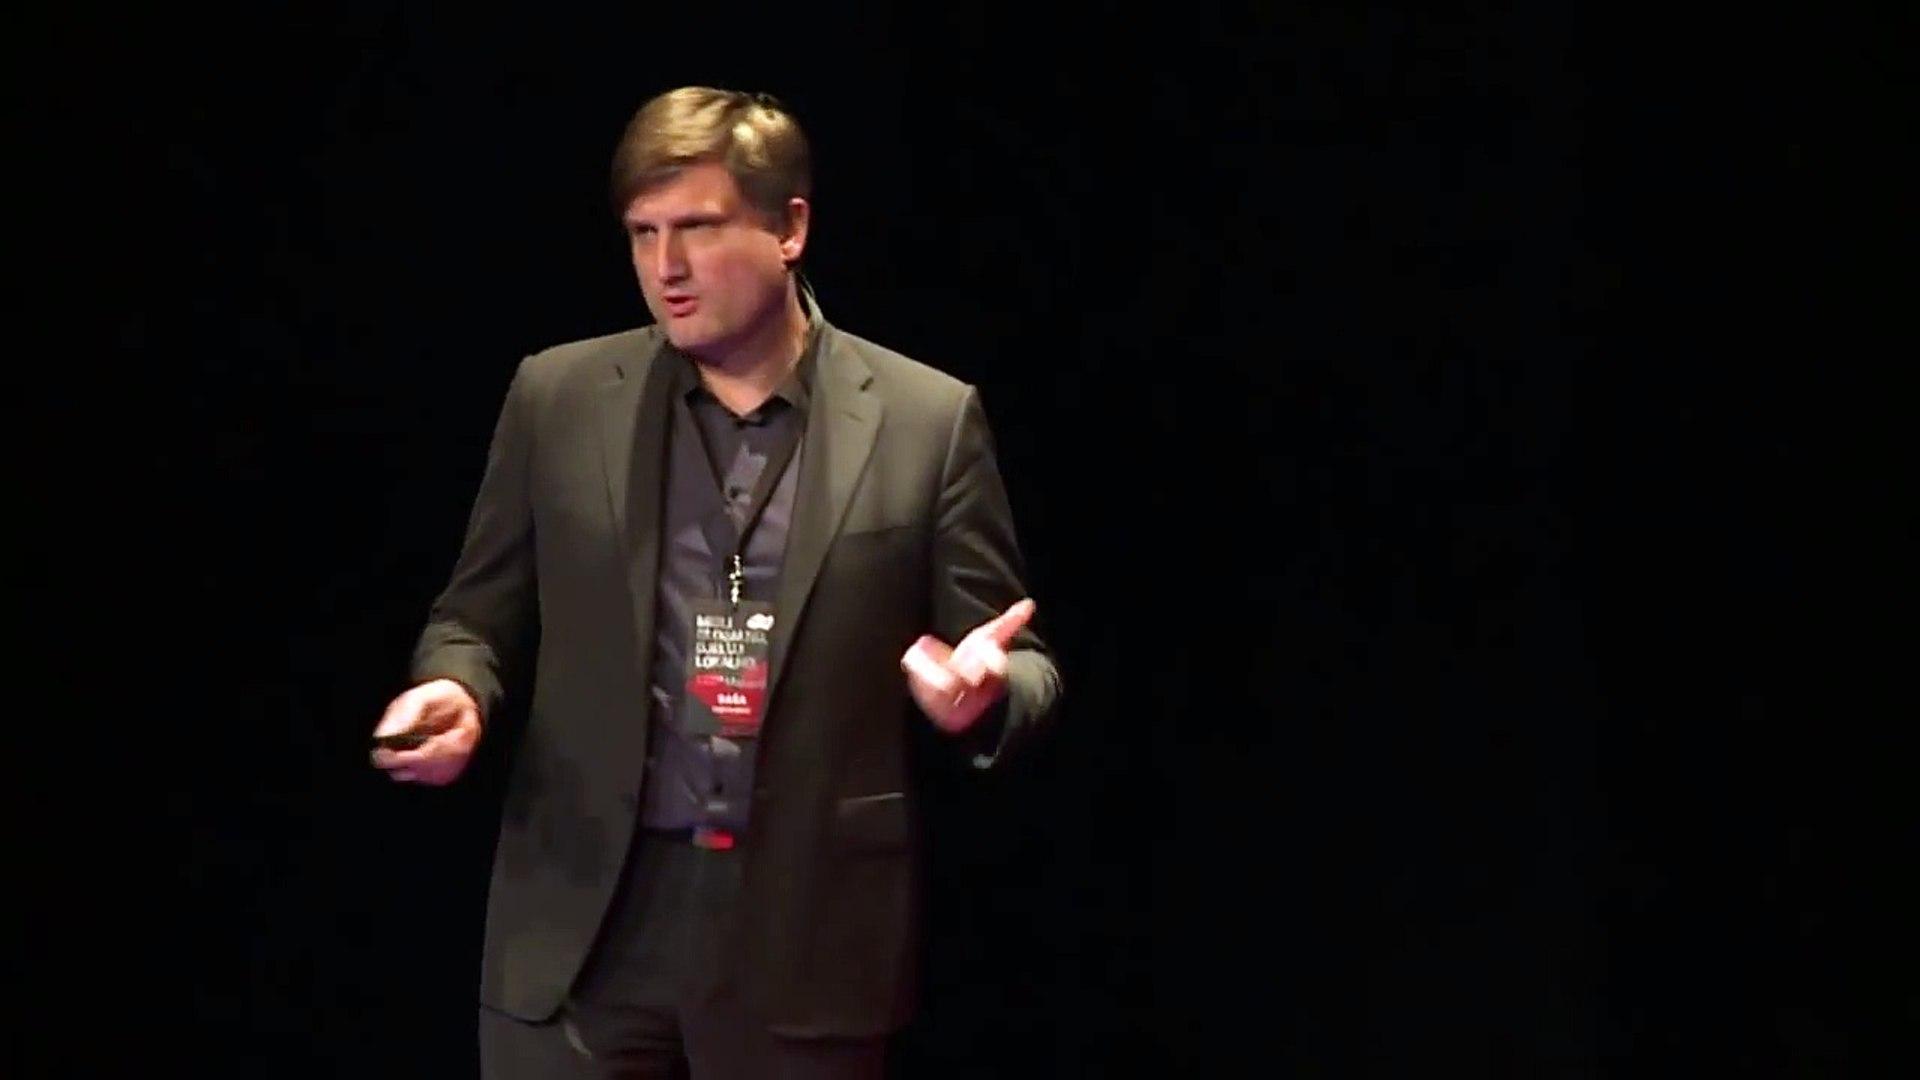 Od apsurdistana do startupistana: Saša Cvetojević at TEDxMaksimir